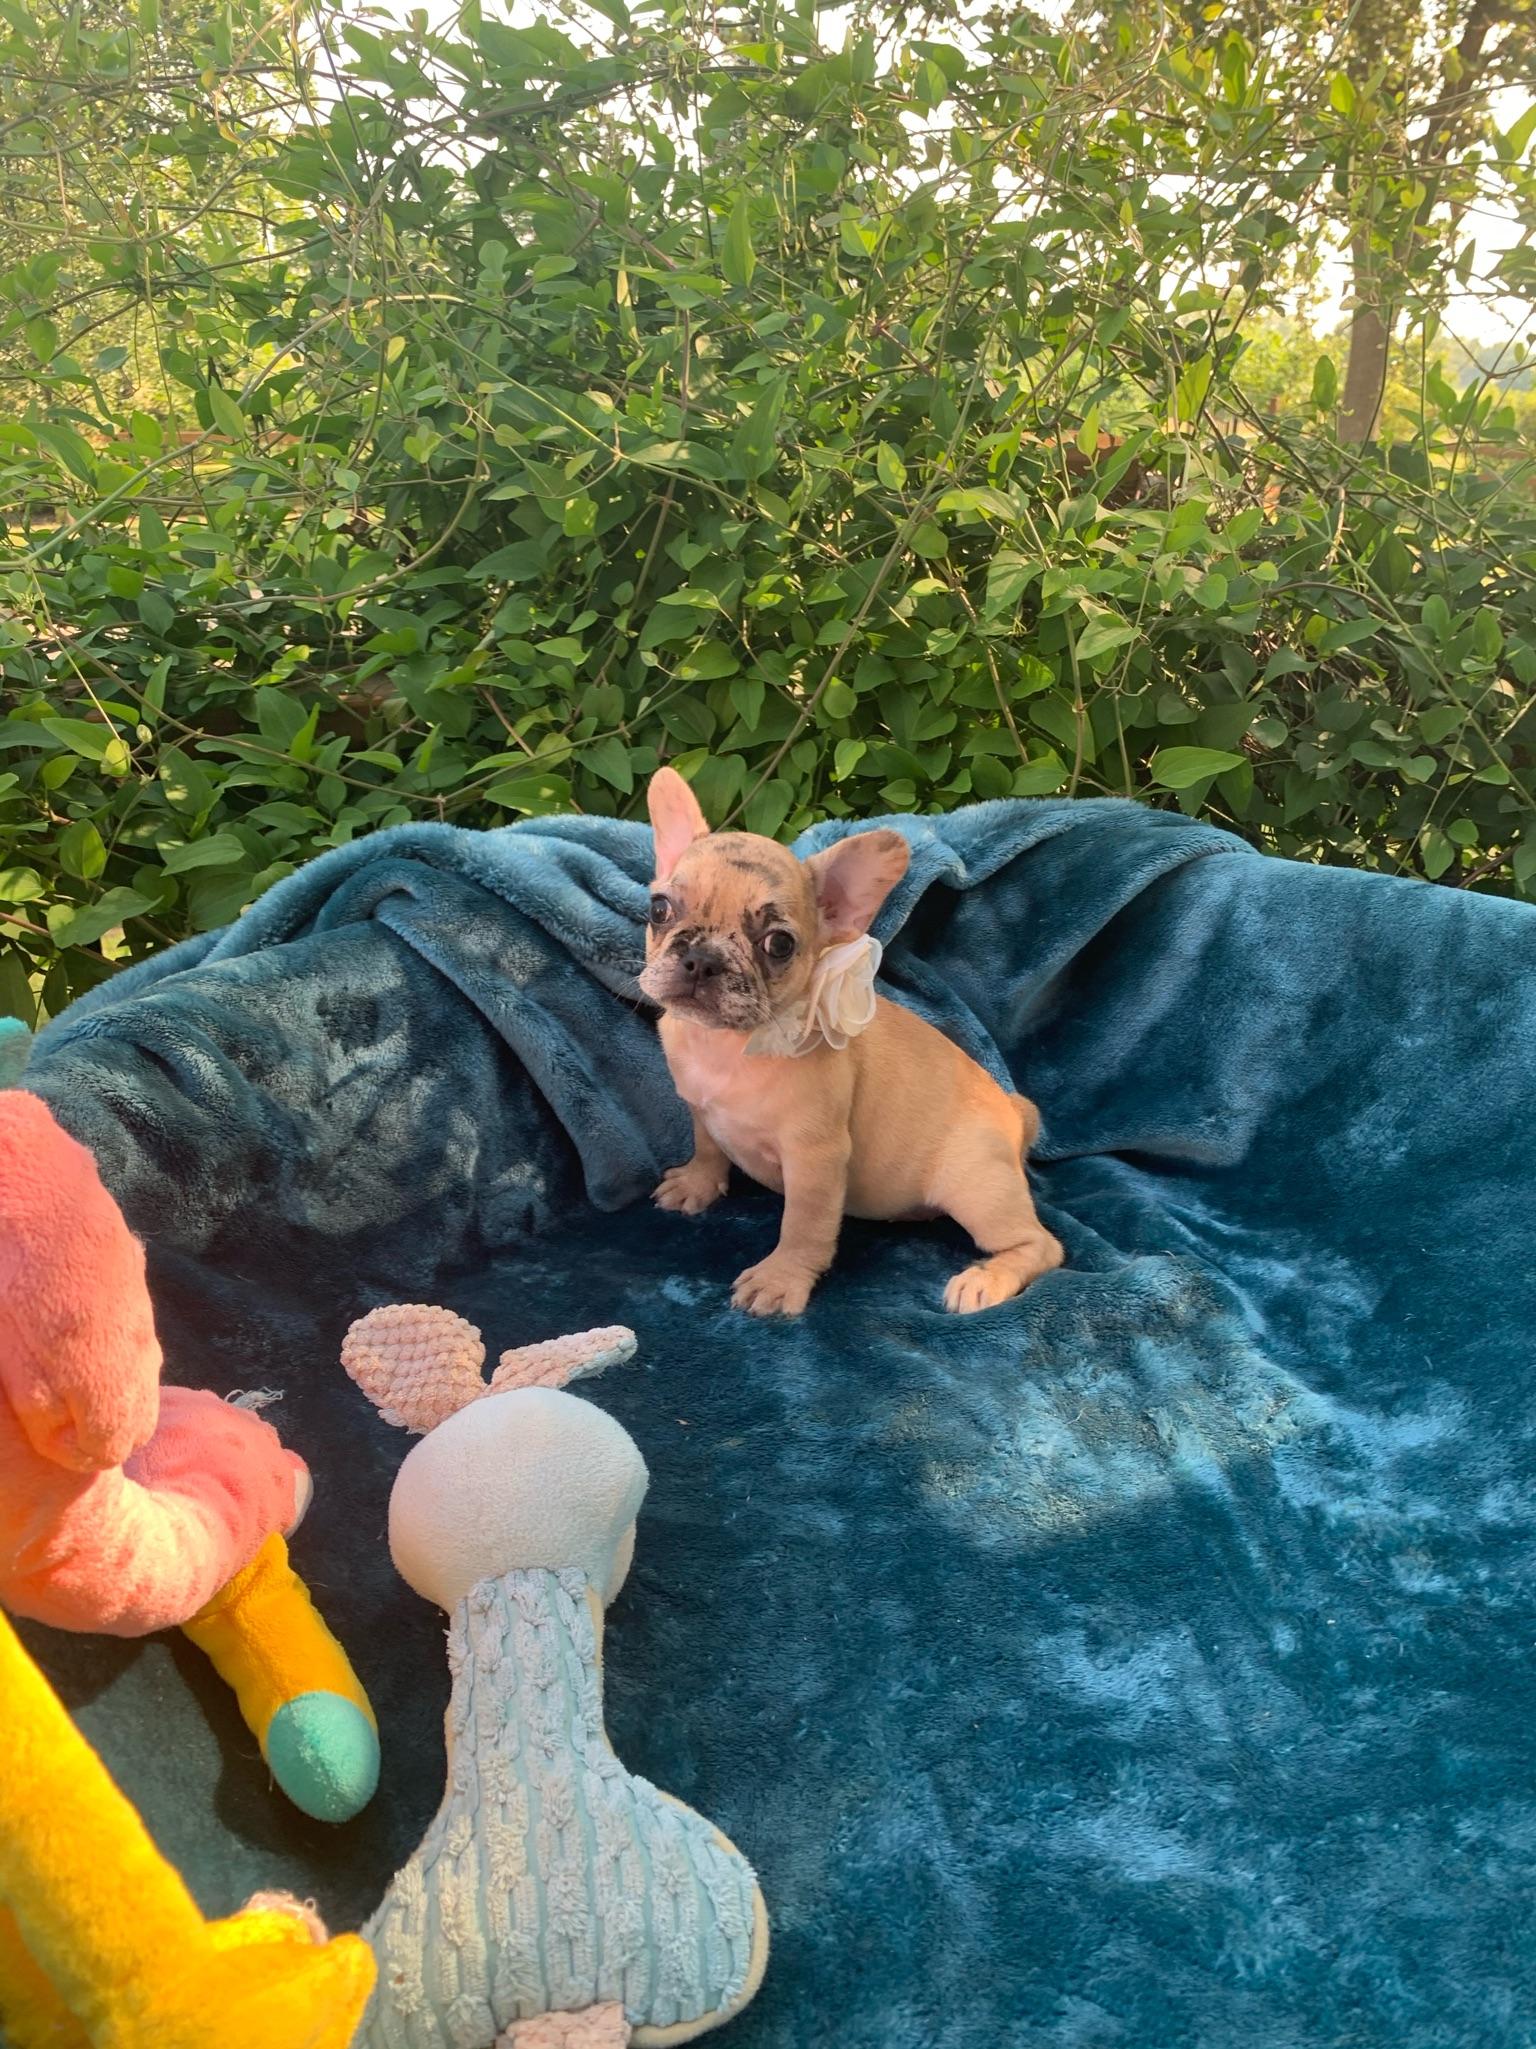 Fawn Merle Female French Bulldog: Athena-SOLD